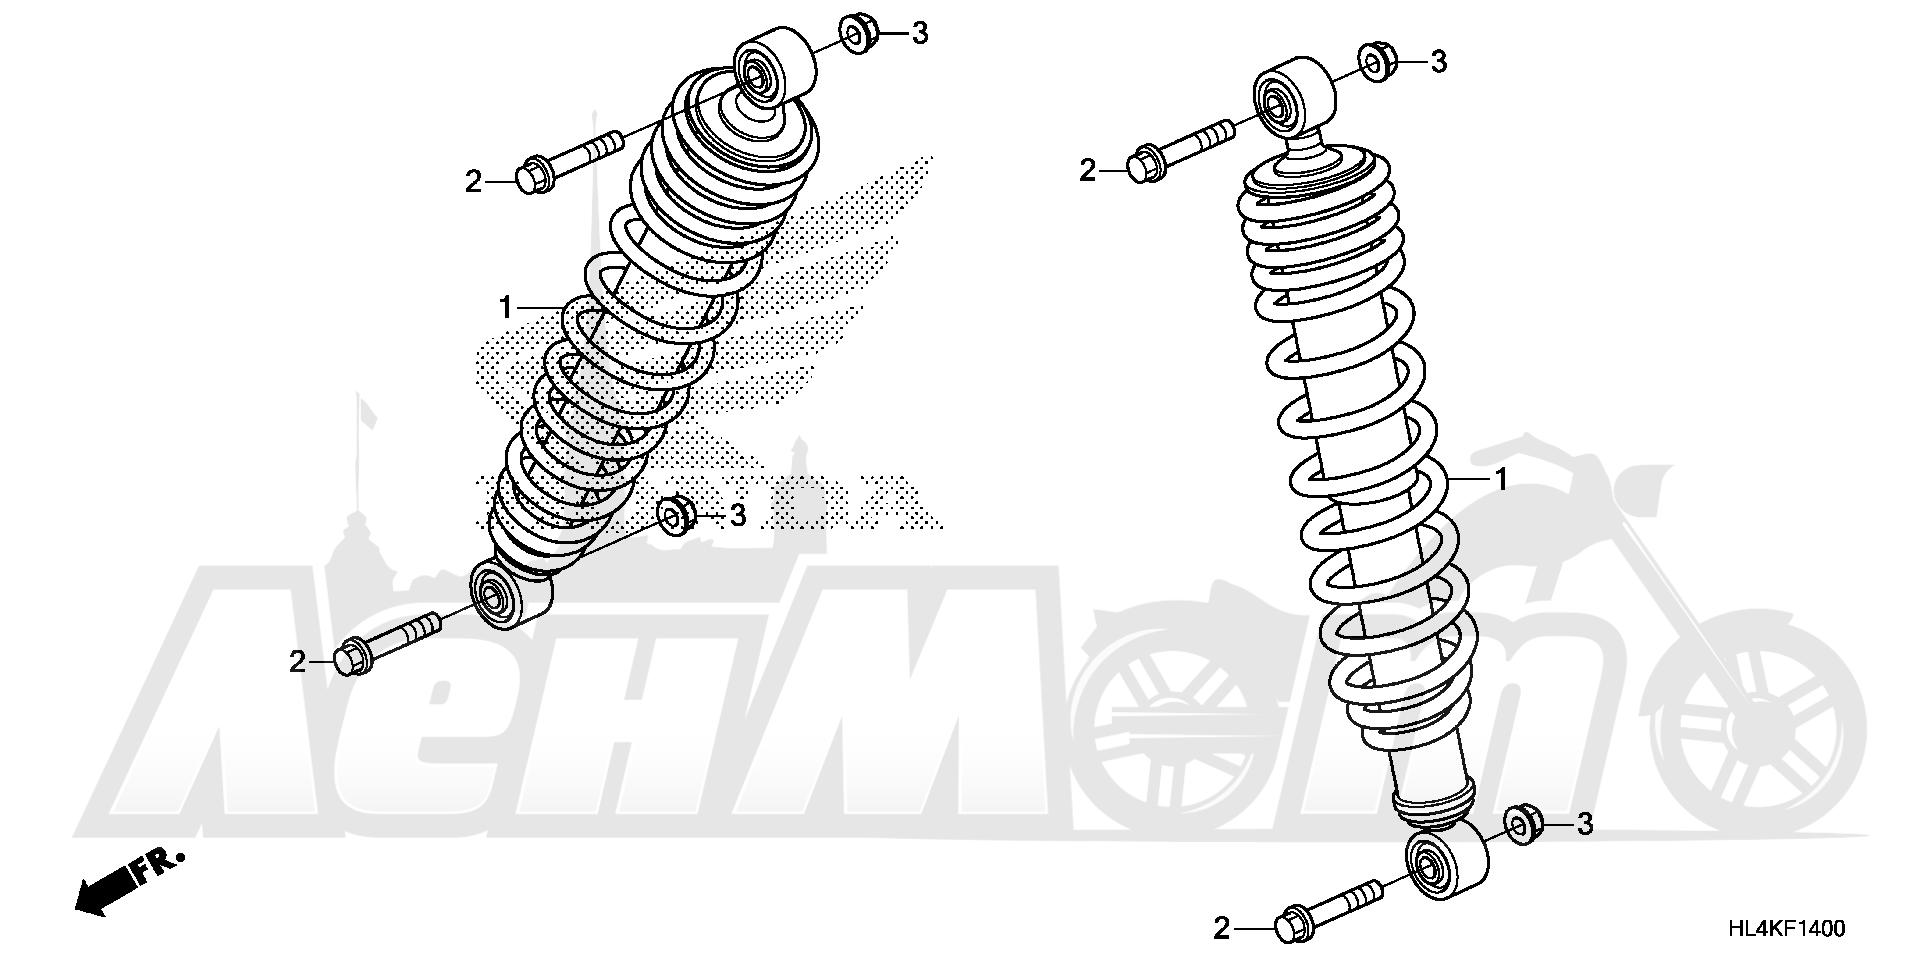 Запчасти для Квадроцикла Honda 2019 SXS1000M5P Раздел: FRONT CUSHION (1) | перед подкладка (1)